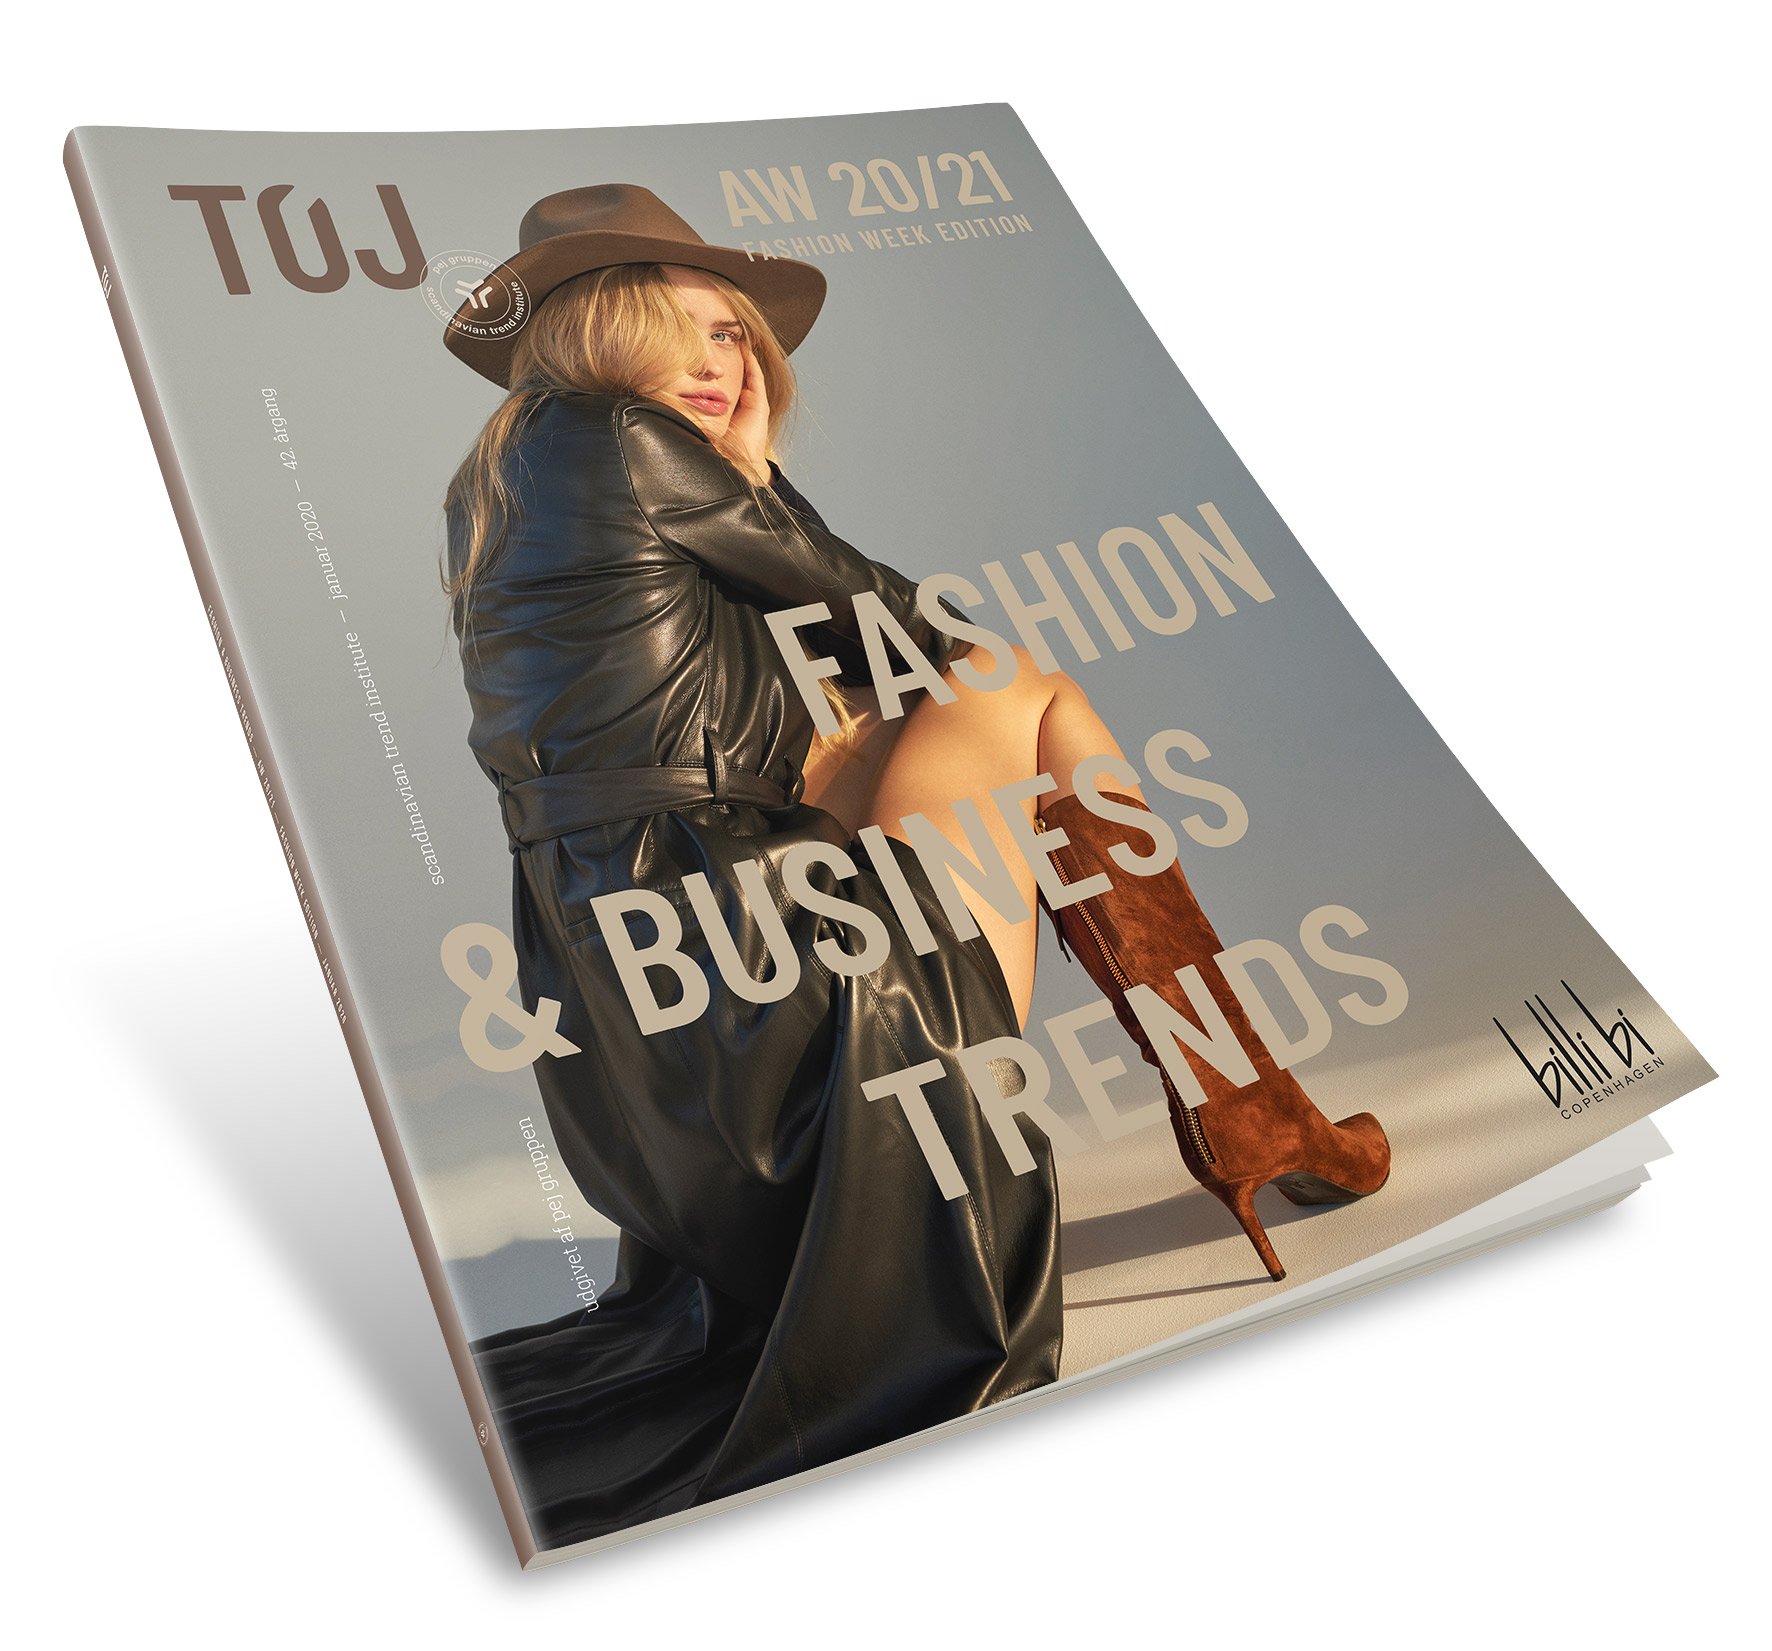 TØJ AW 20/21 Fashion Week Edition